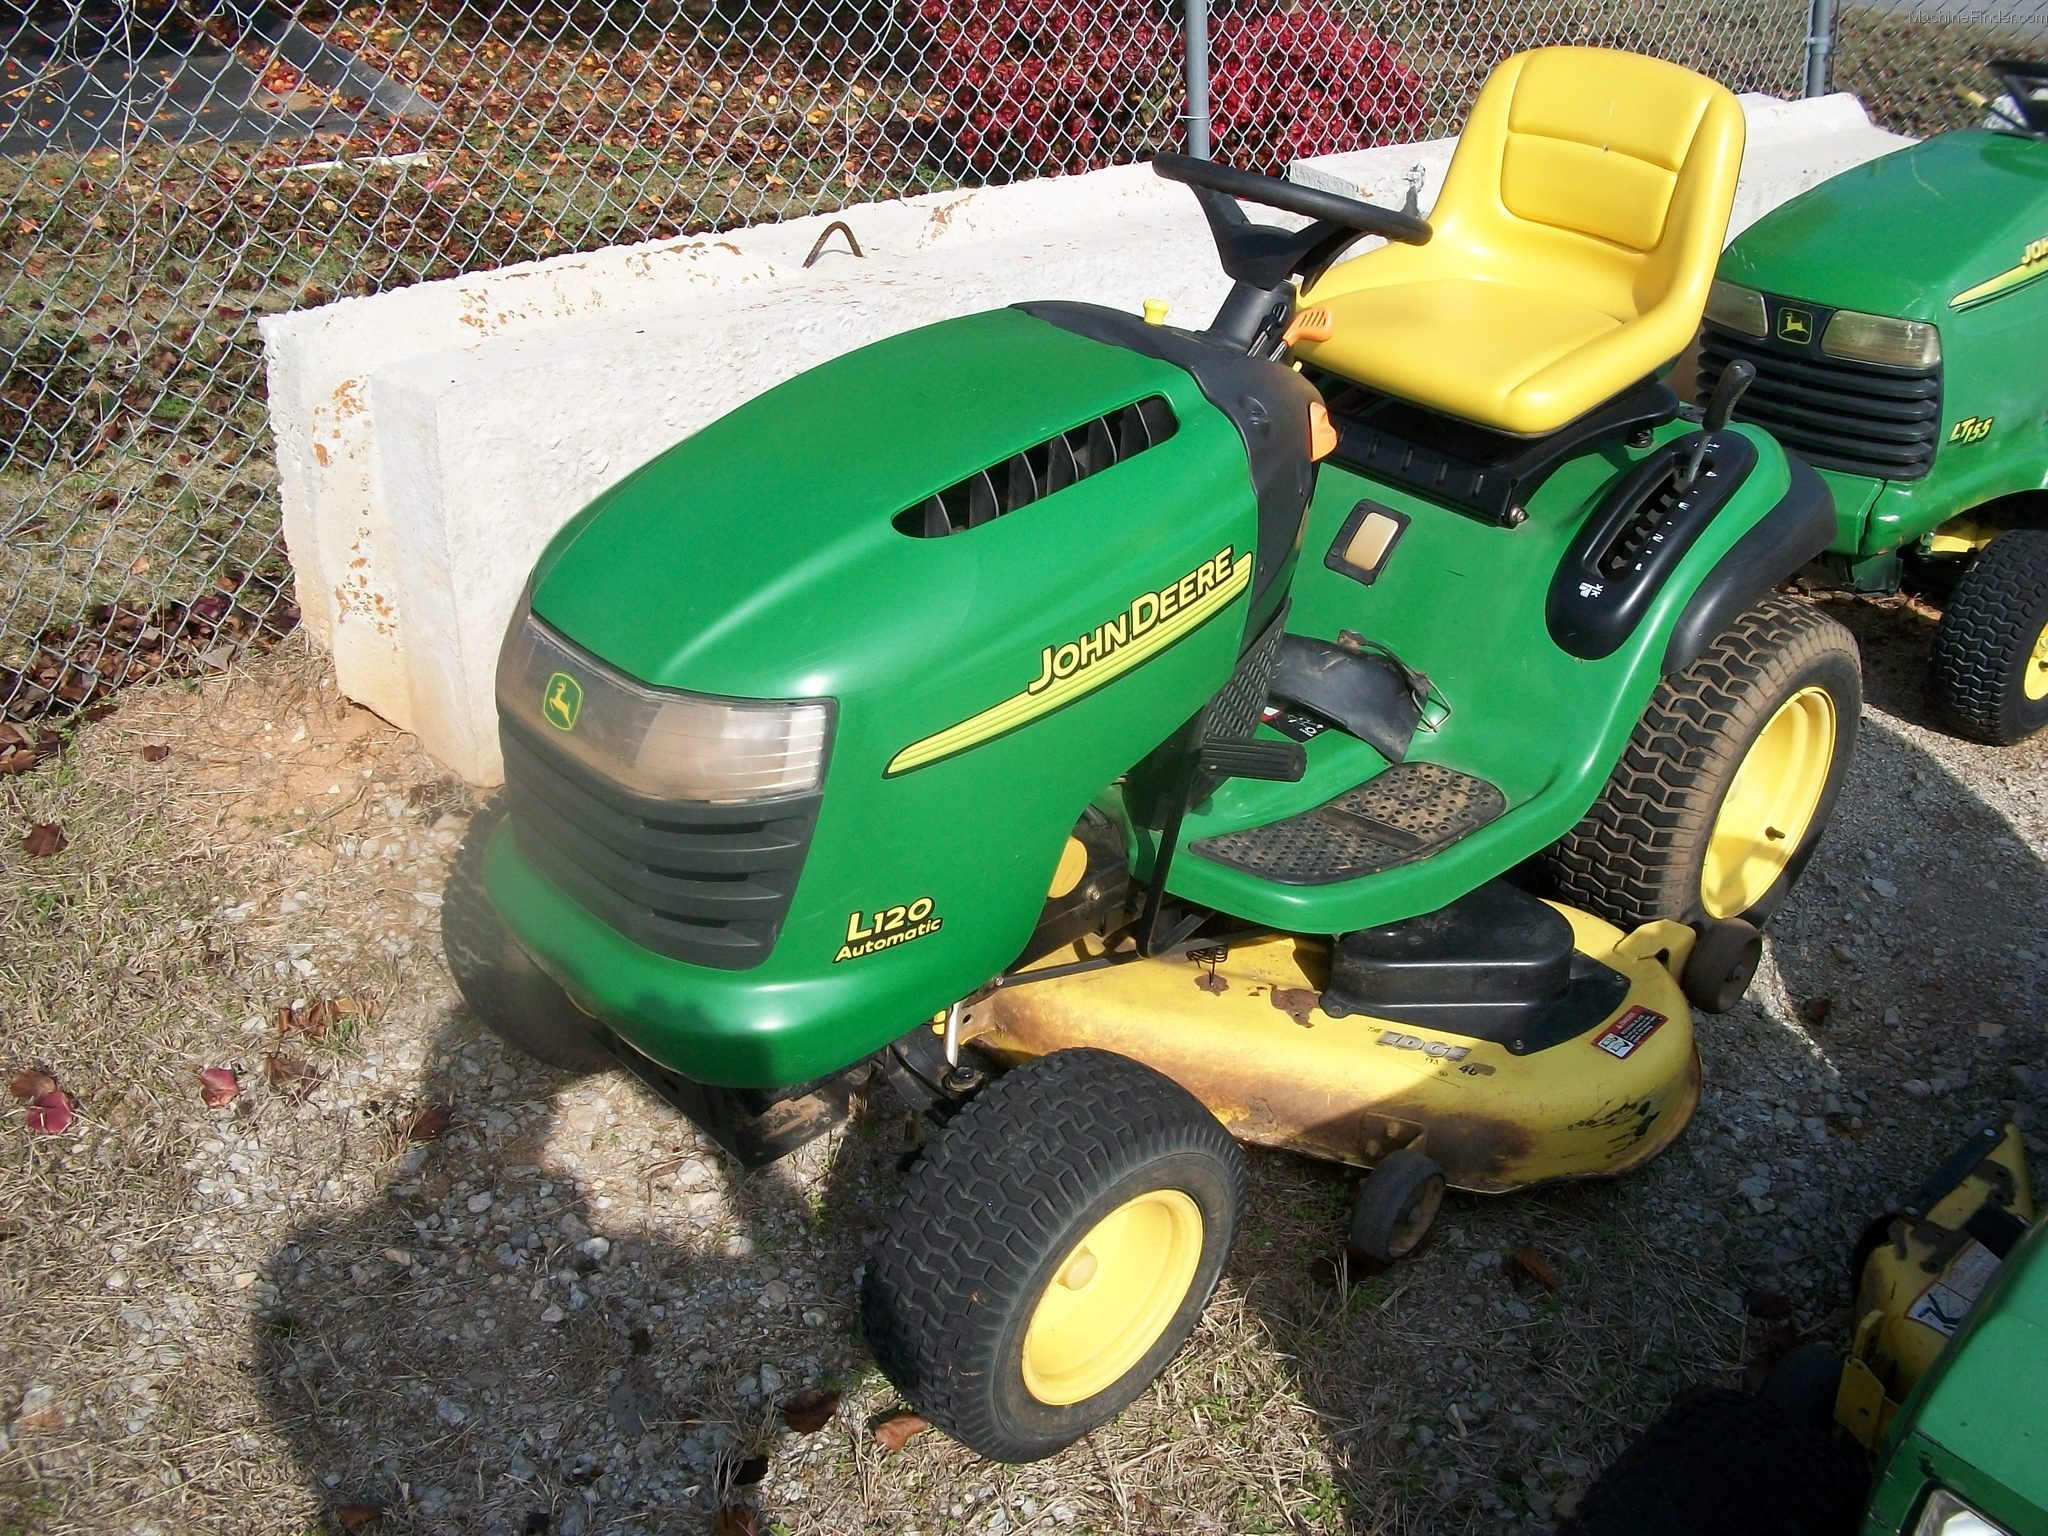 John Deere L120 Motor Motors Www Carburetor Diagram Wiring Need Schematic For Lawn Tractor